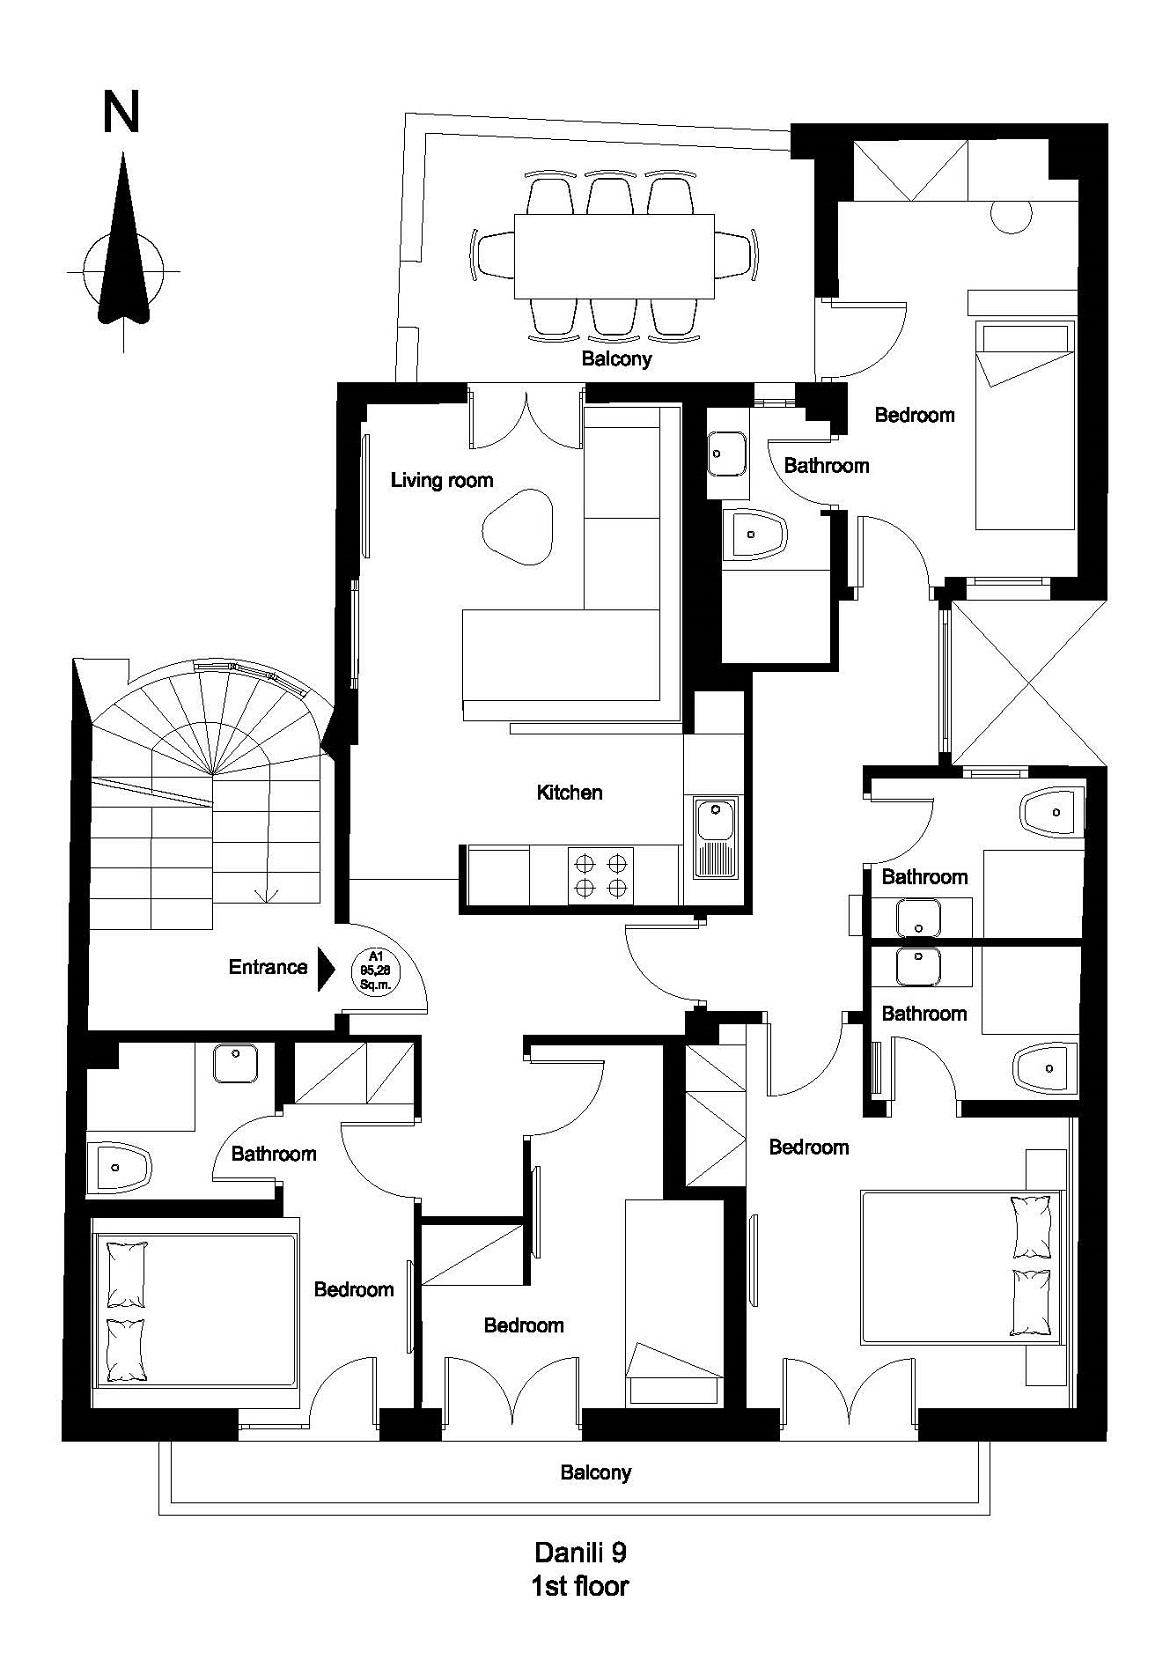 Danili 9 1st floor plan